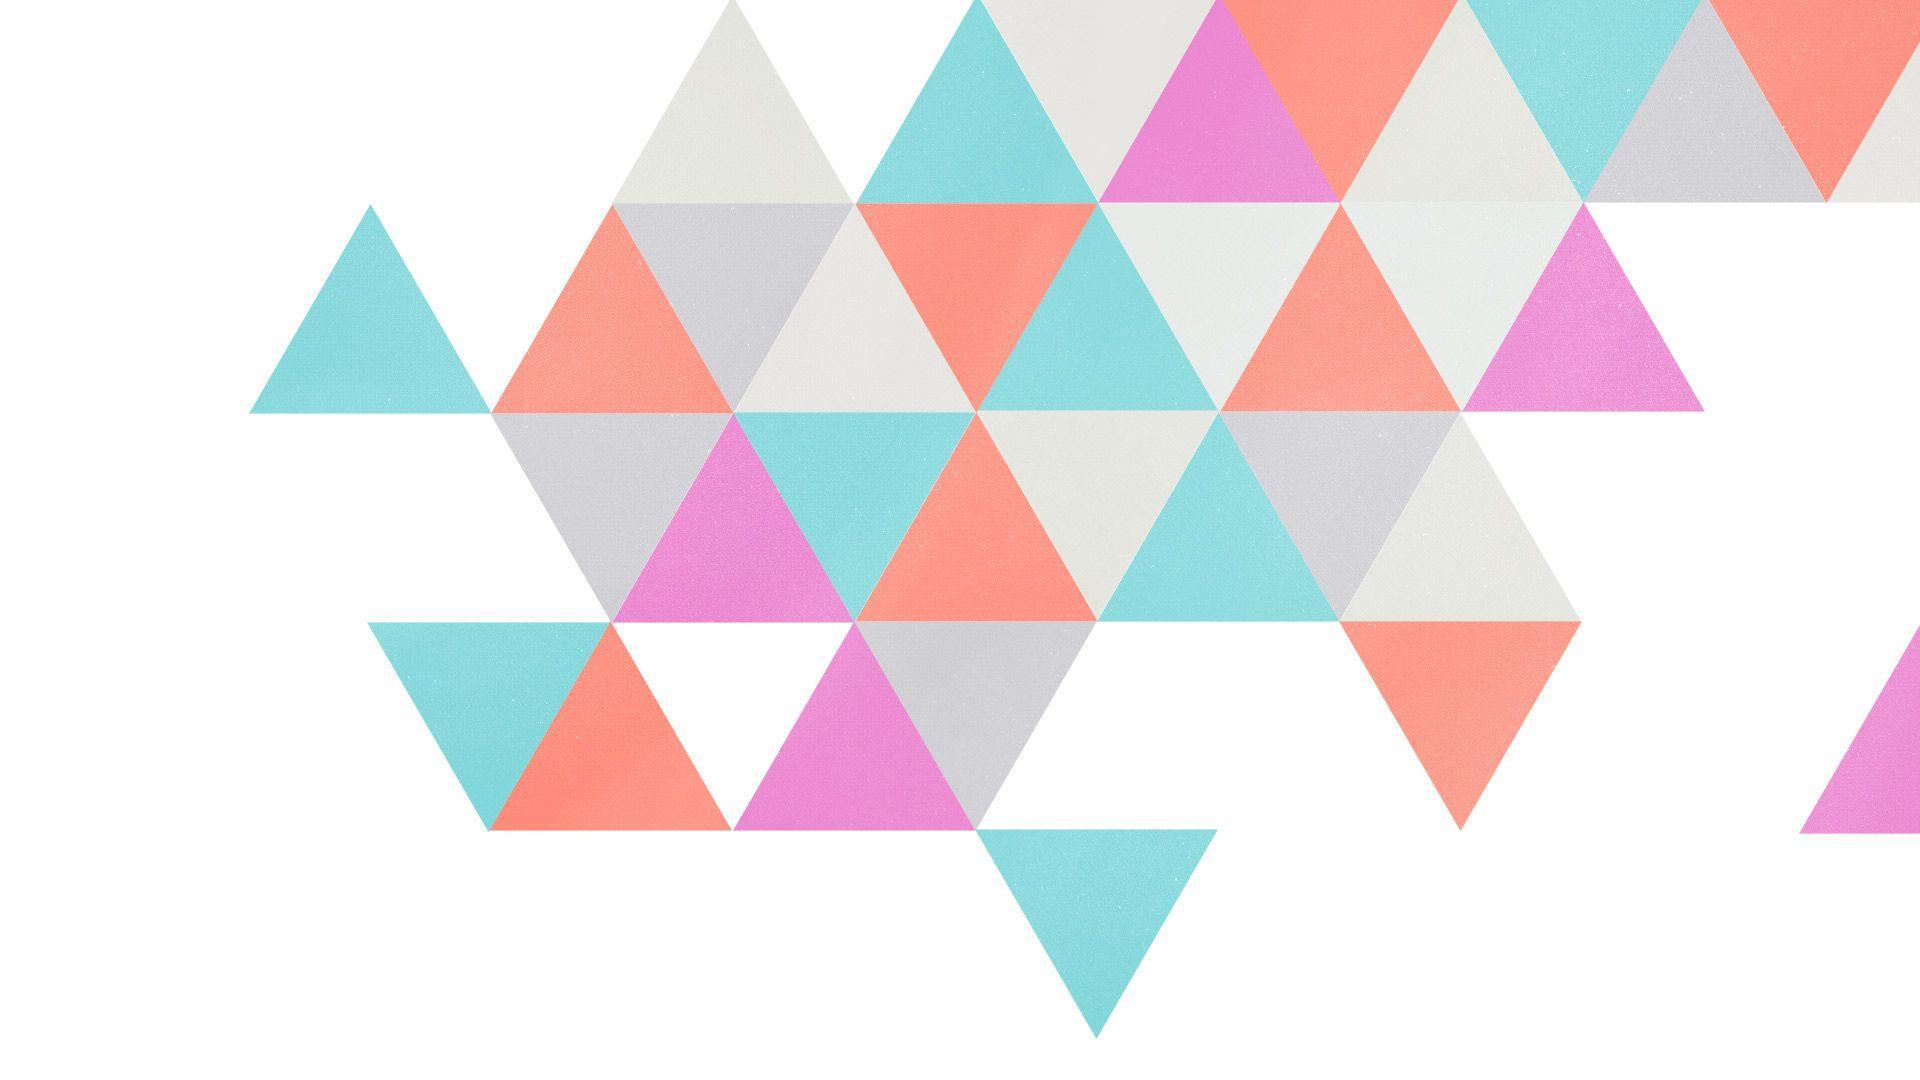 White Geometric Wallpaper 182 1920x1080 - uMad.com